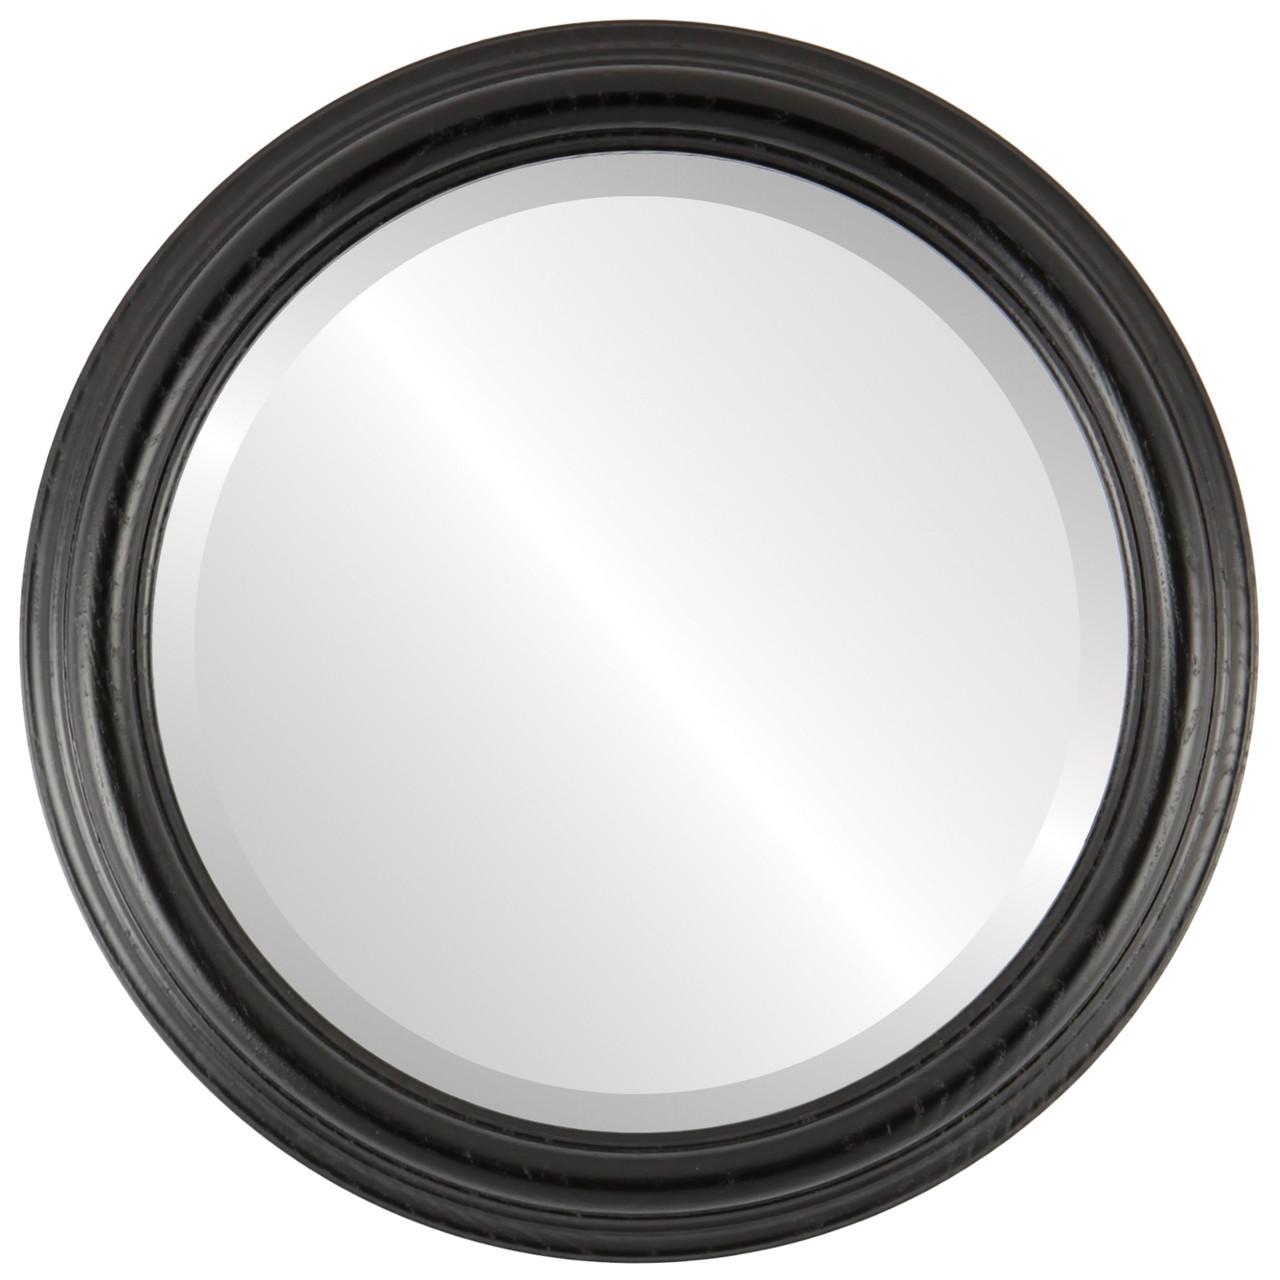 Round Framed Mirror #300 Melbourne Matte Black Finish